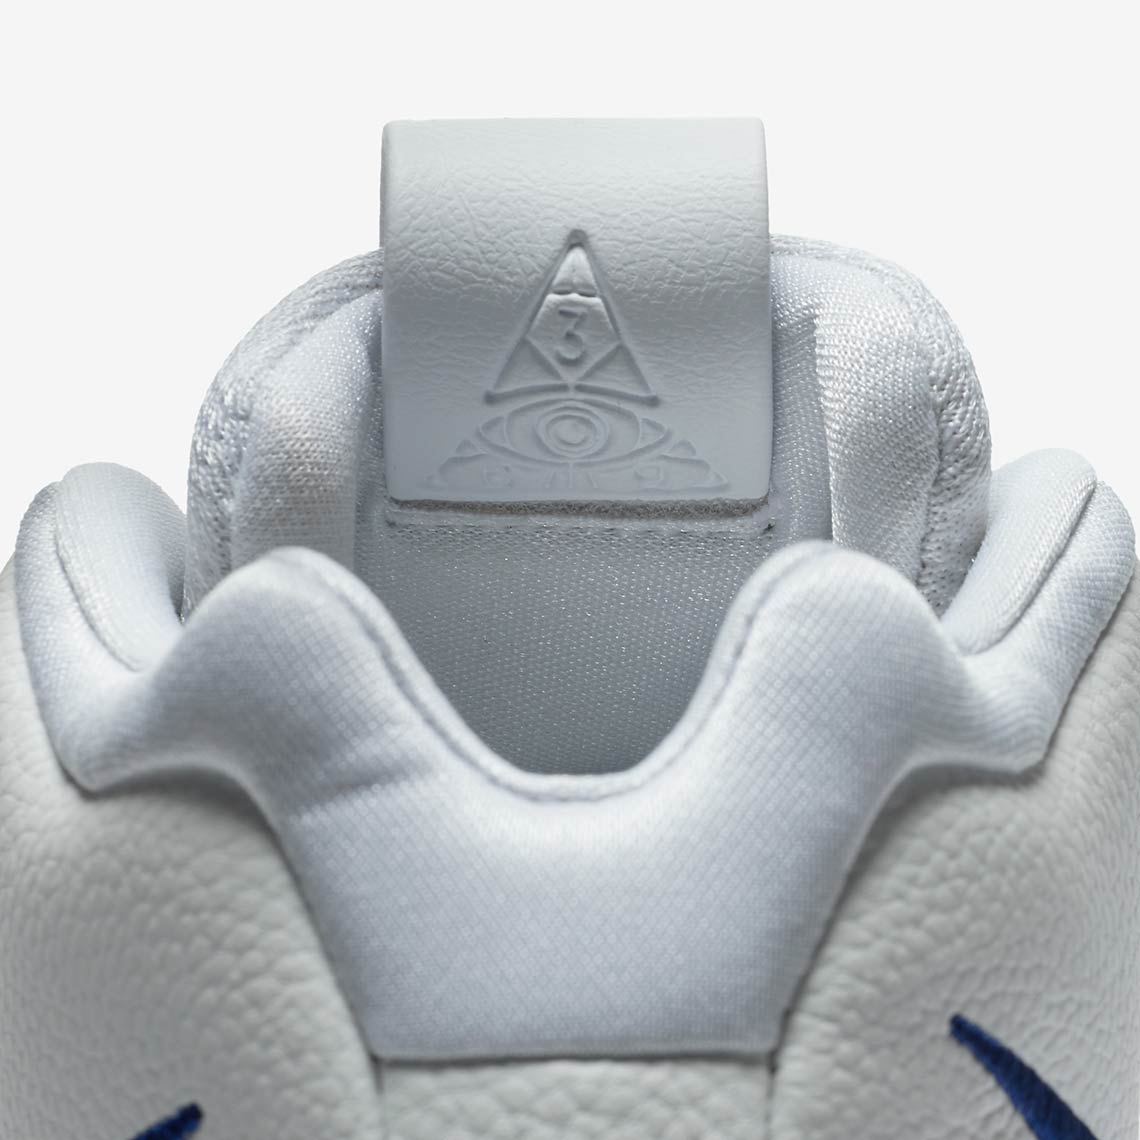 promo code cebe2 ba3b3 Nike Kyrie 4